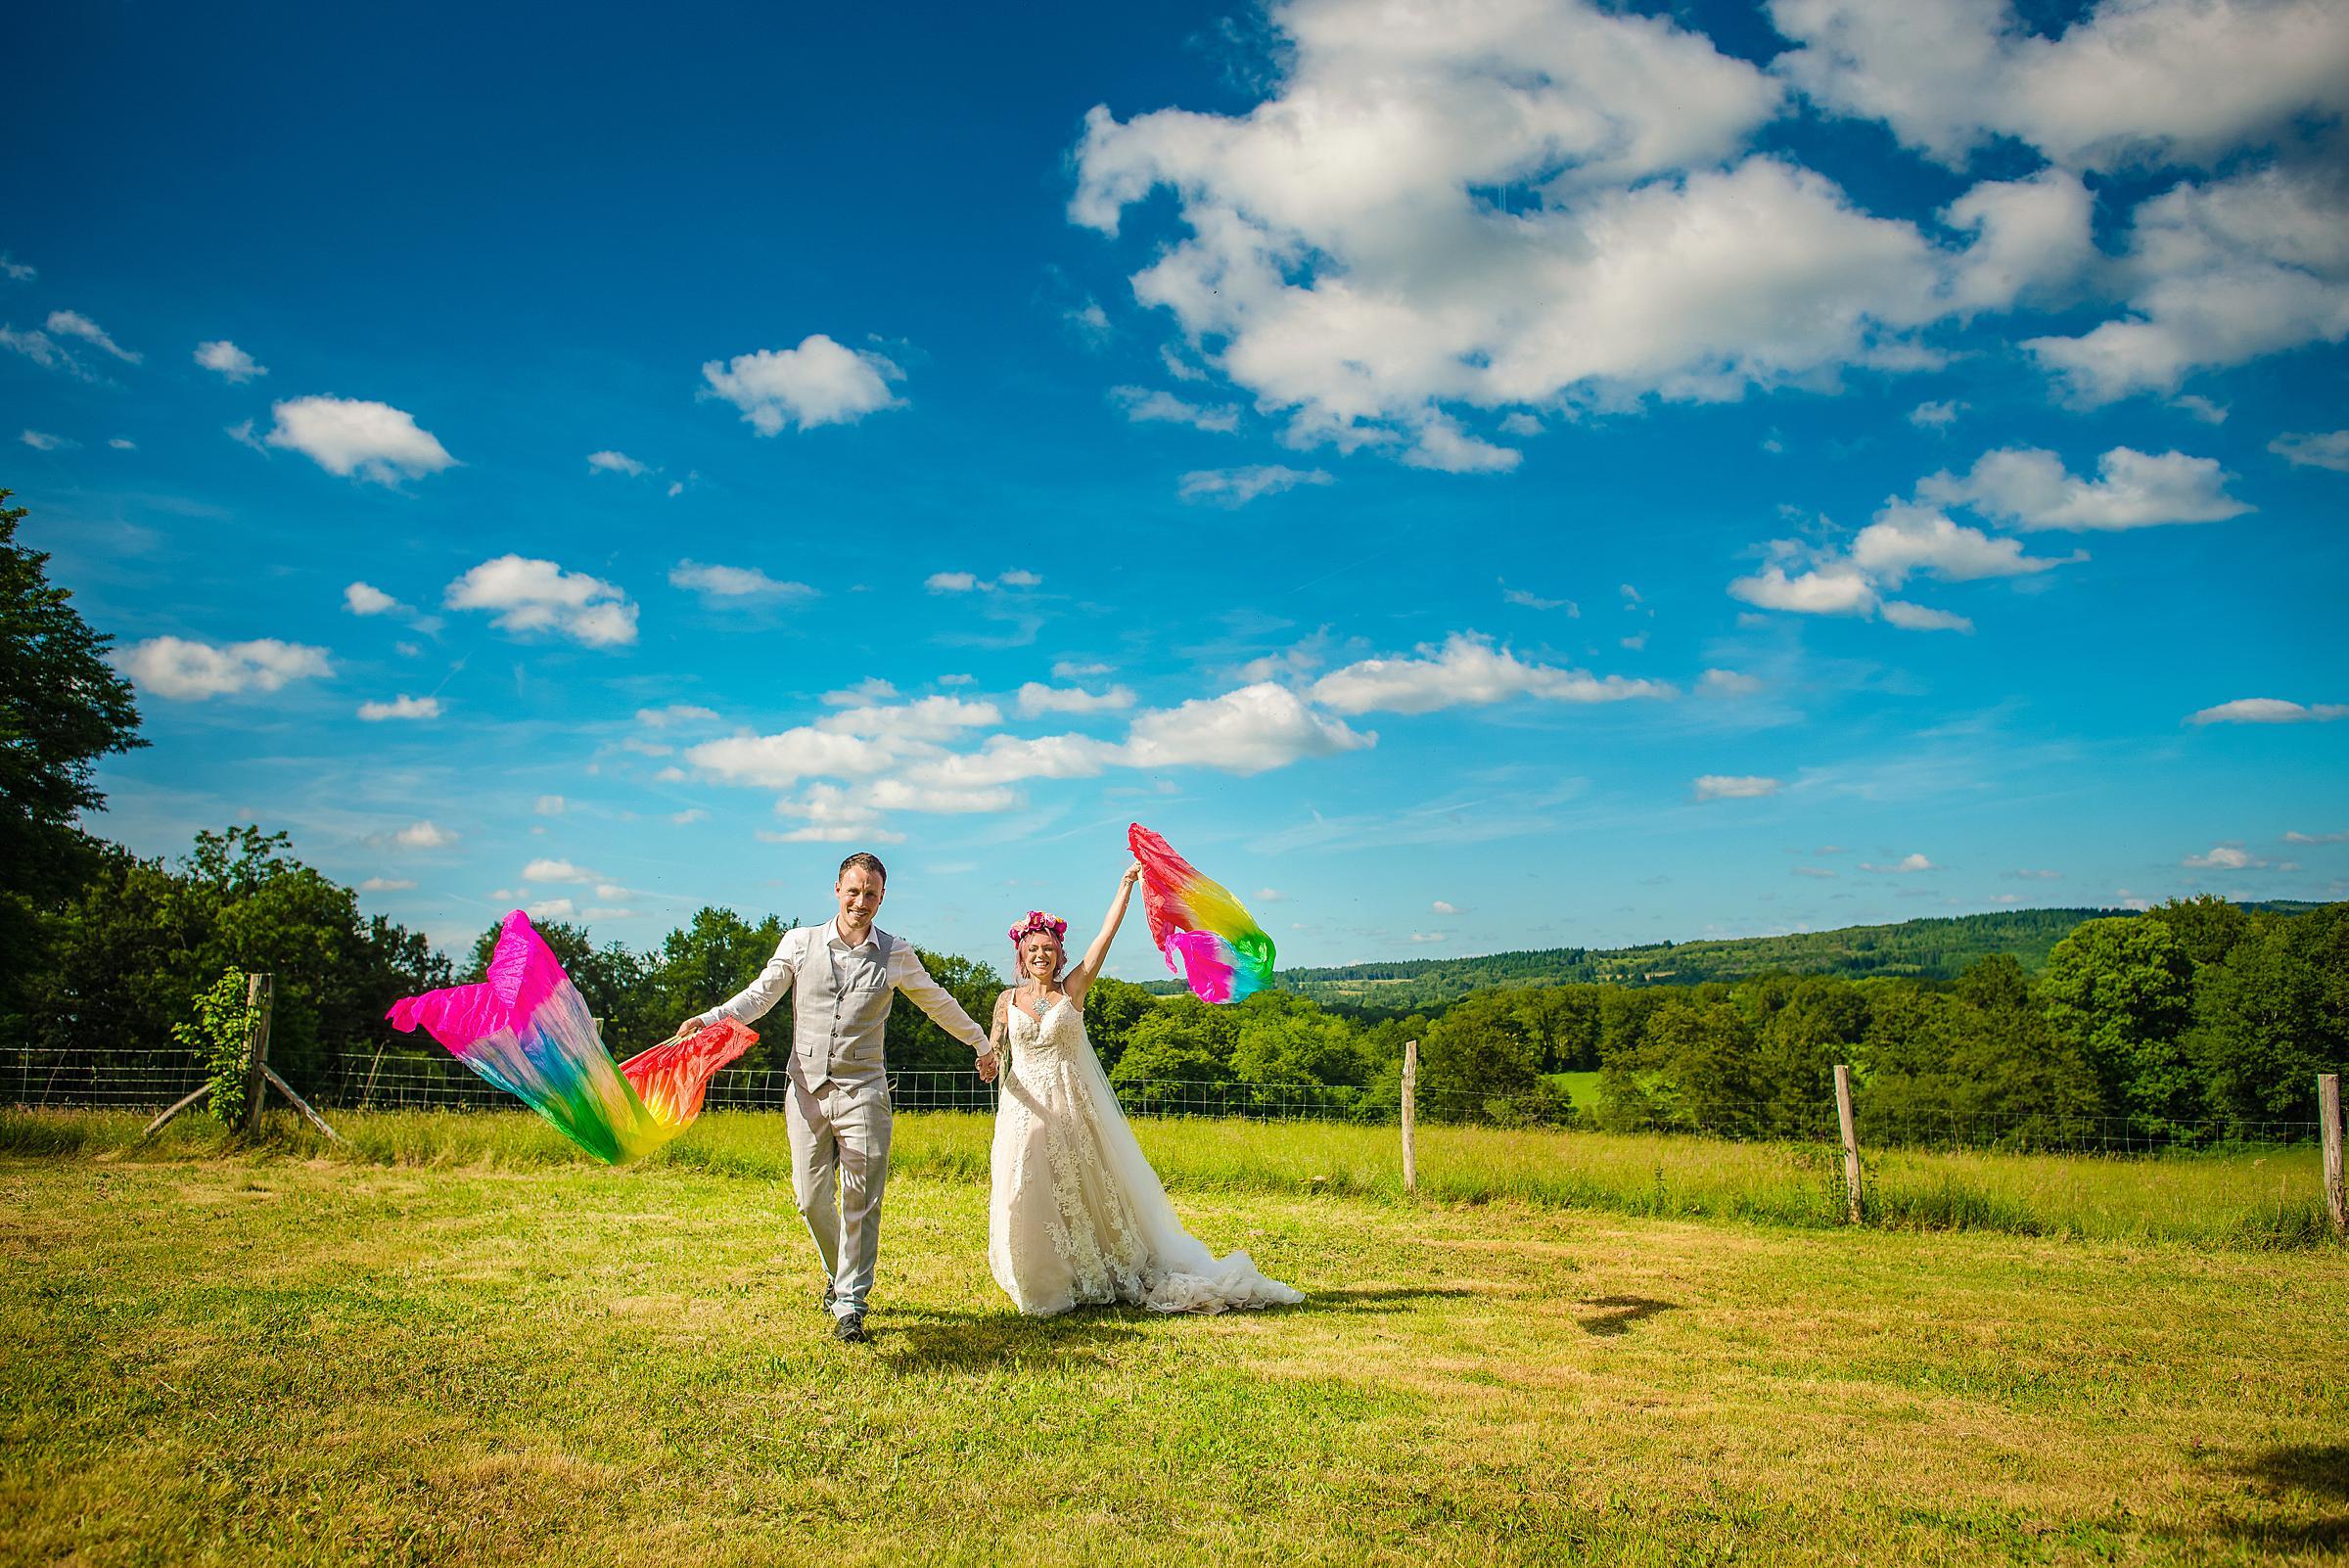 Back Garden Festival Wedding in France - Rainbow Pride